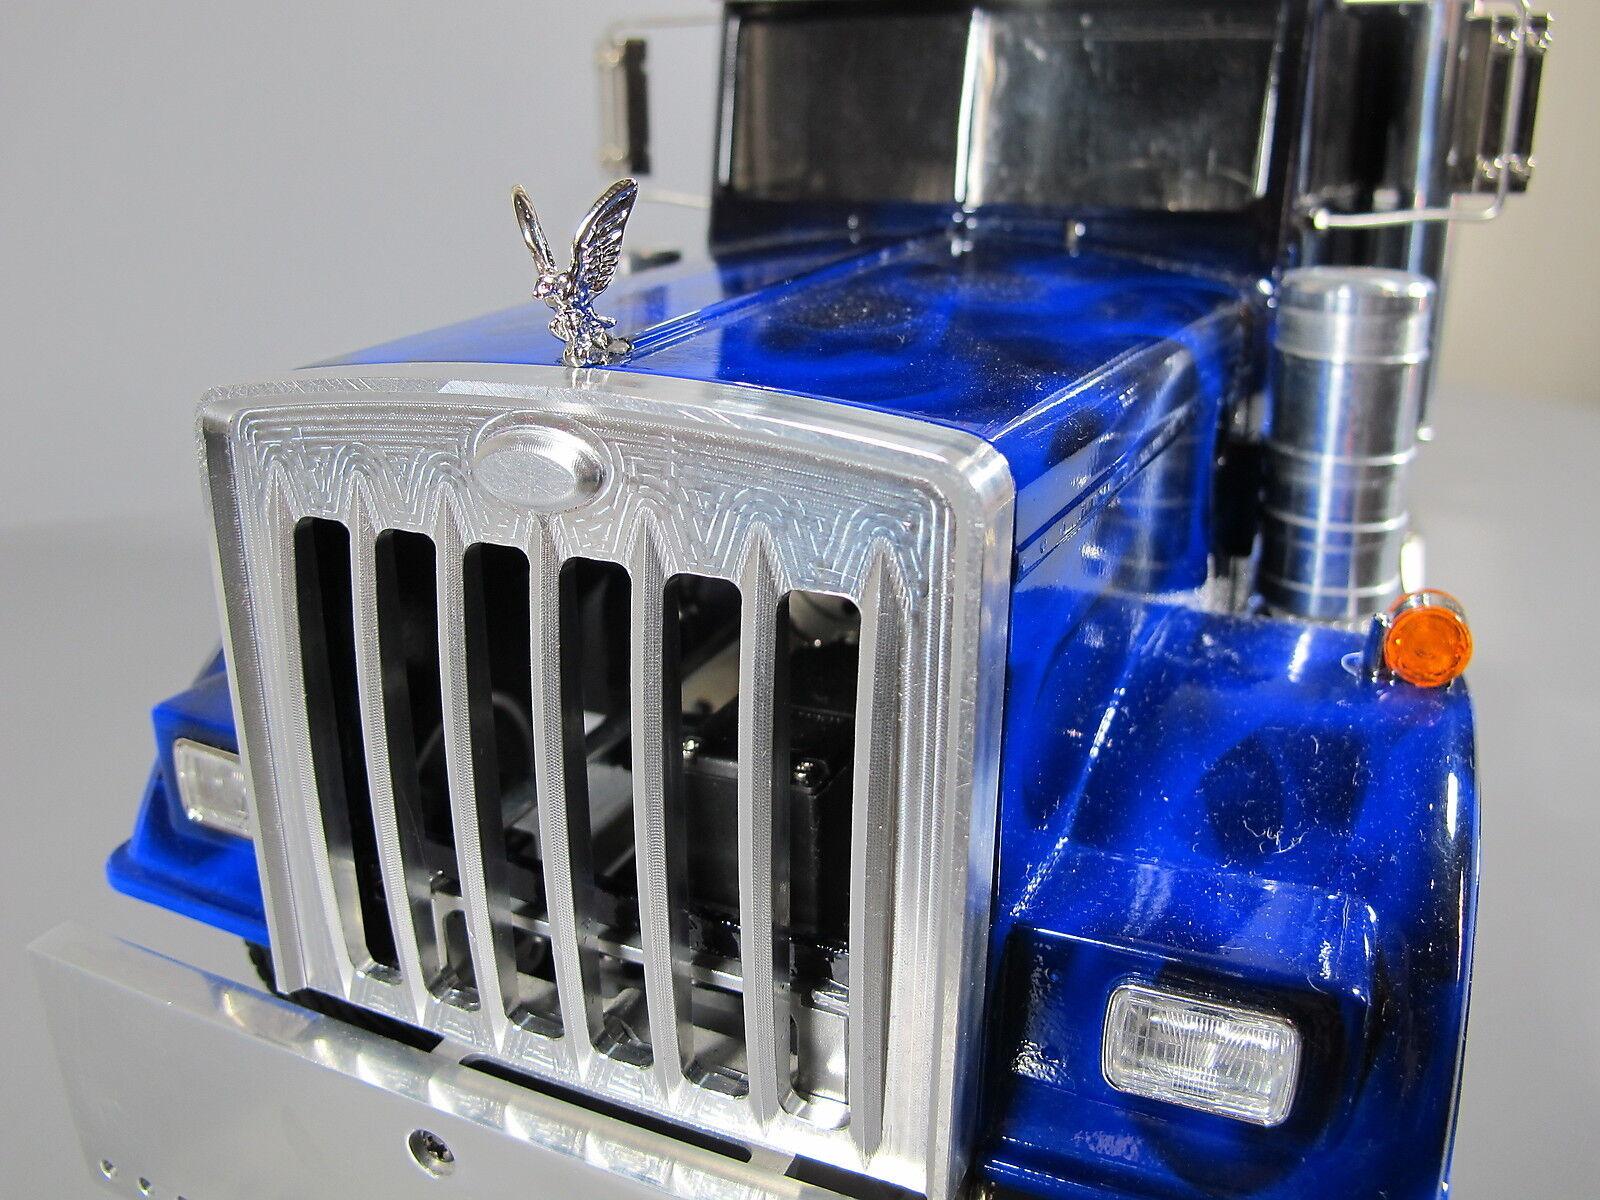 Aluminum Front Grill Guard + Hood Eagle Ornament 1 14 Tamiya King Grand Hauler